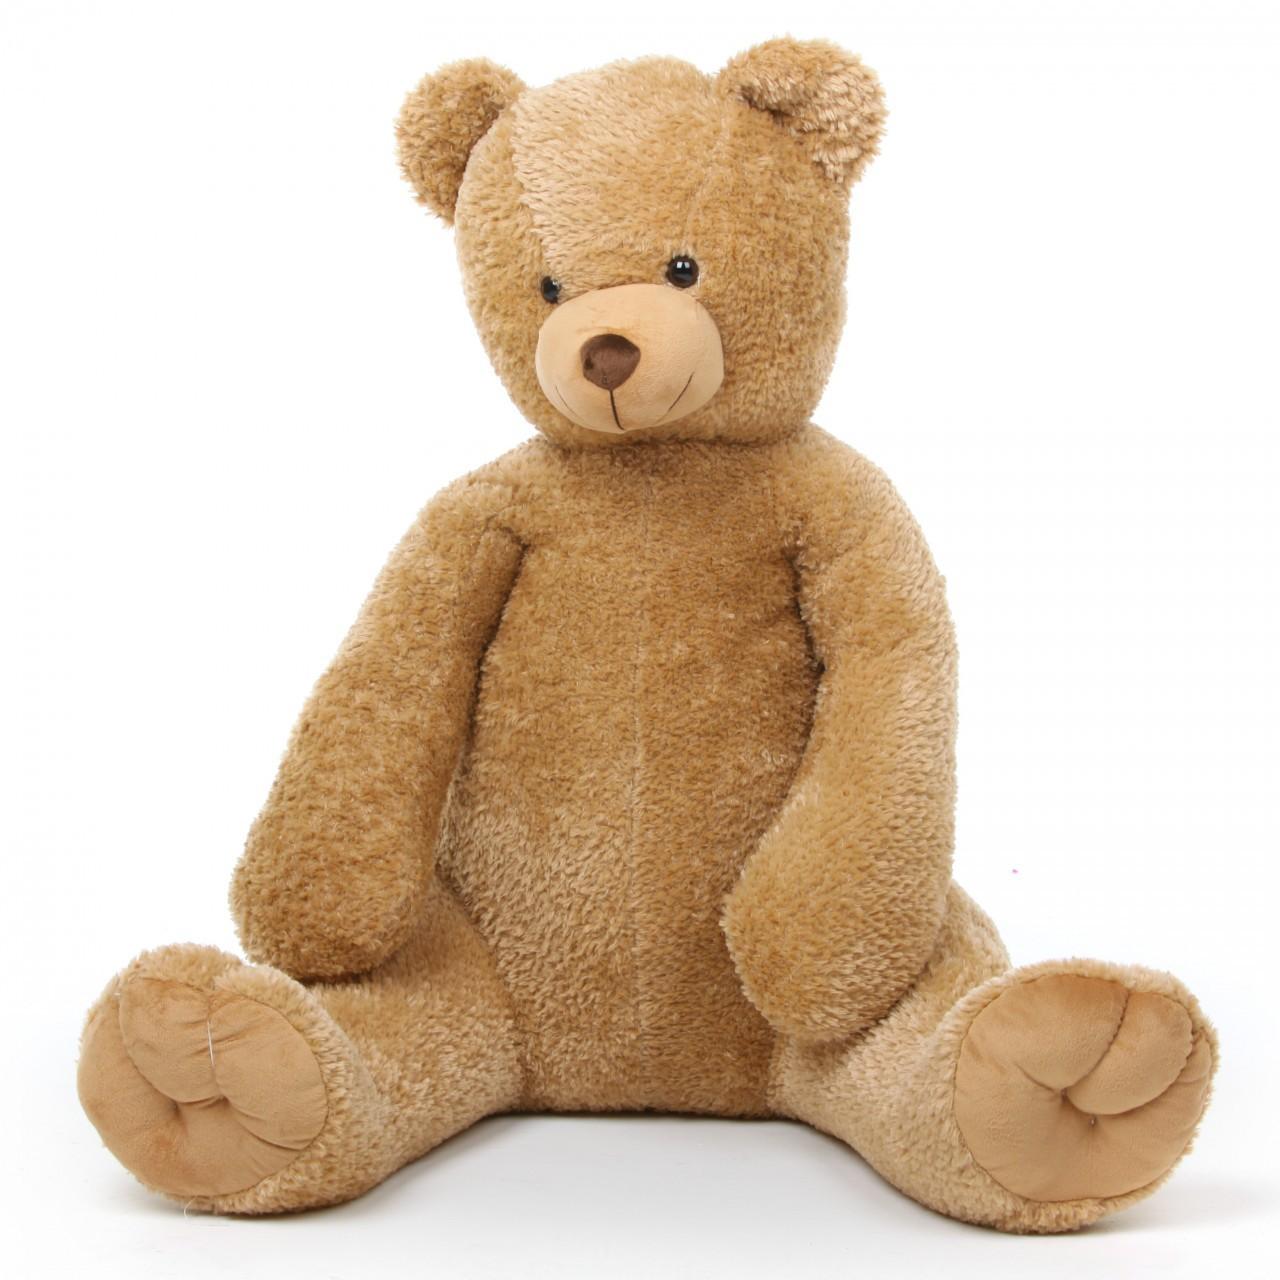 Teddy Bear Template | Teddy Bear Blank Template Imgflip